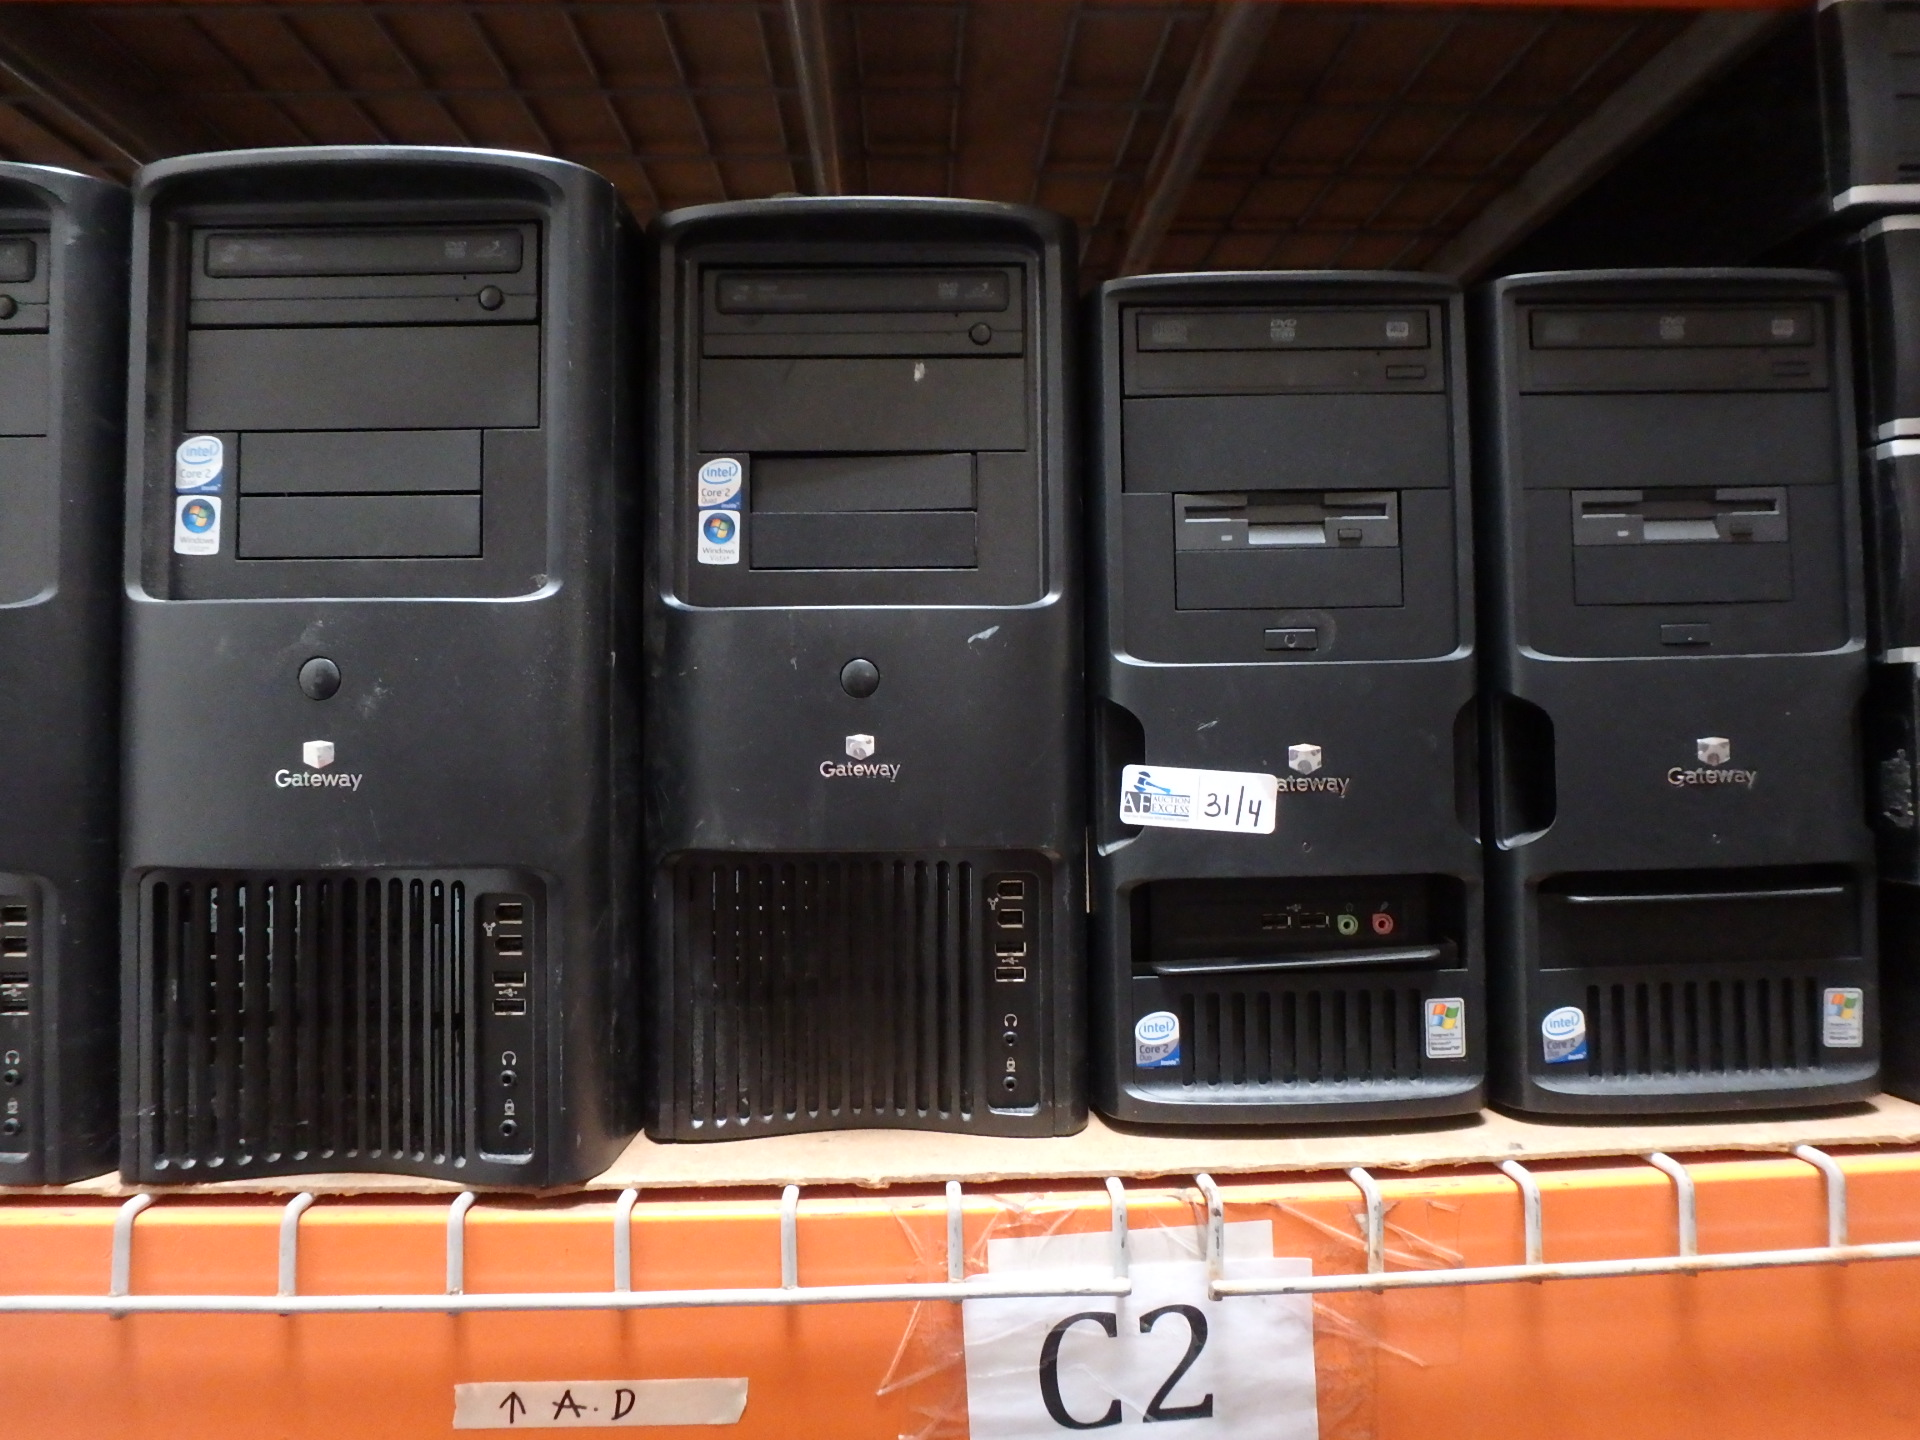 Lot 31 - LOT OF 4 GATEWAY COMPUTERS